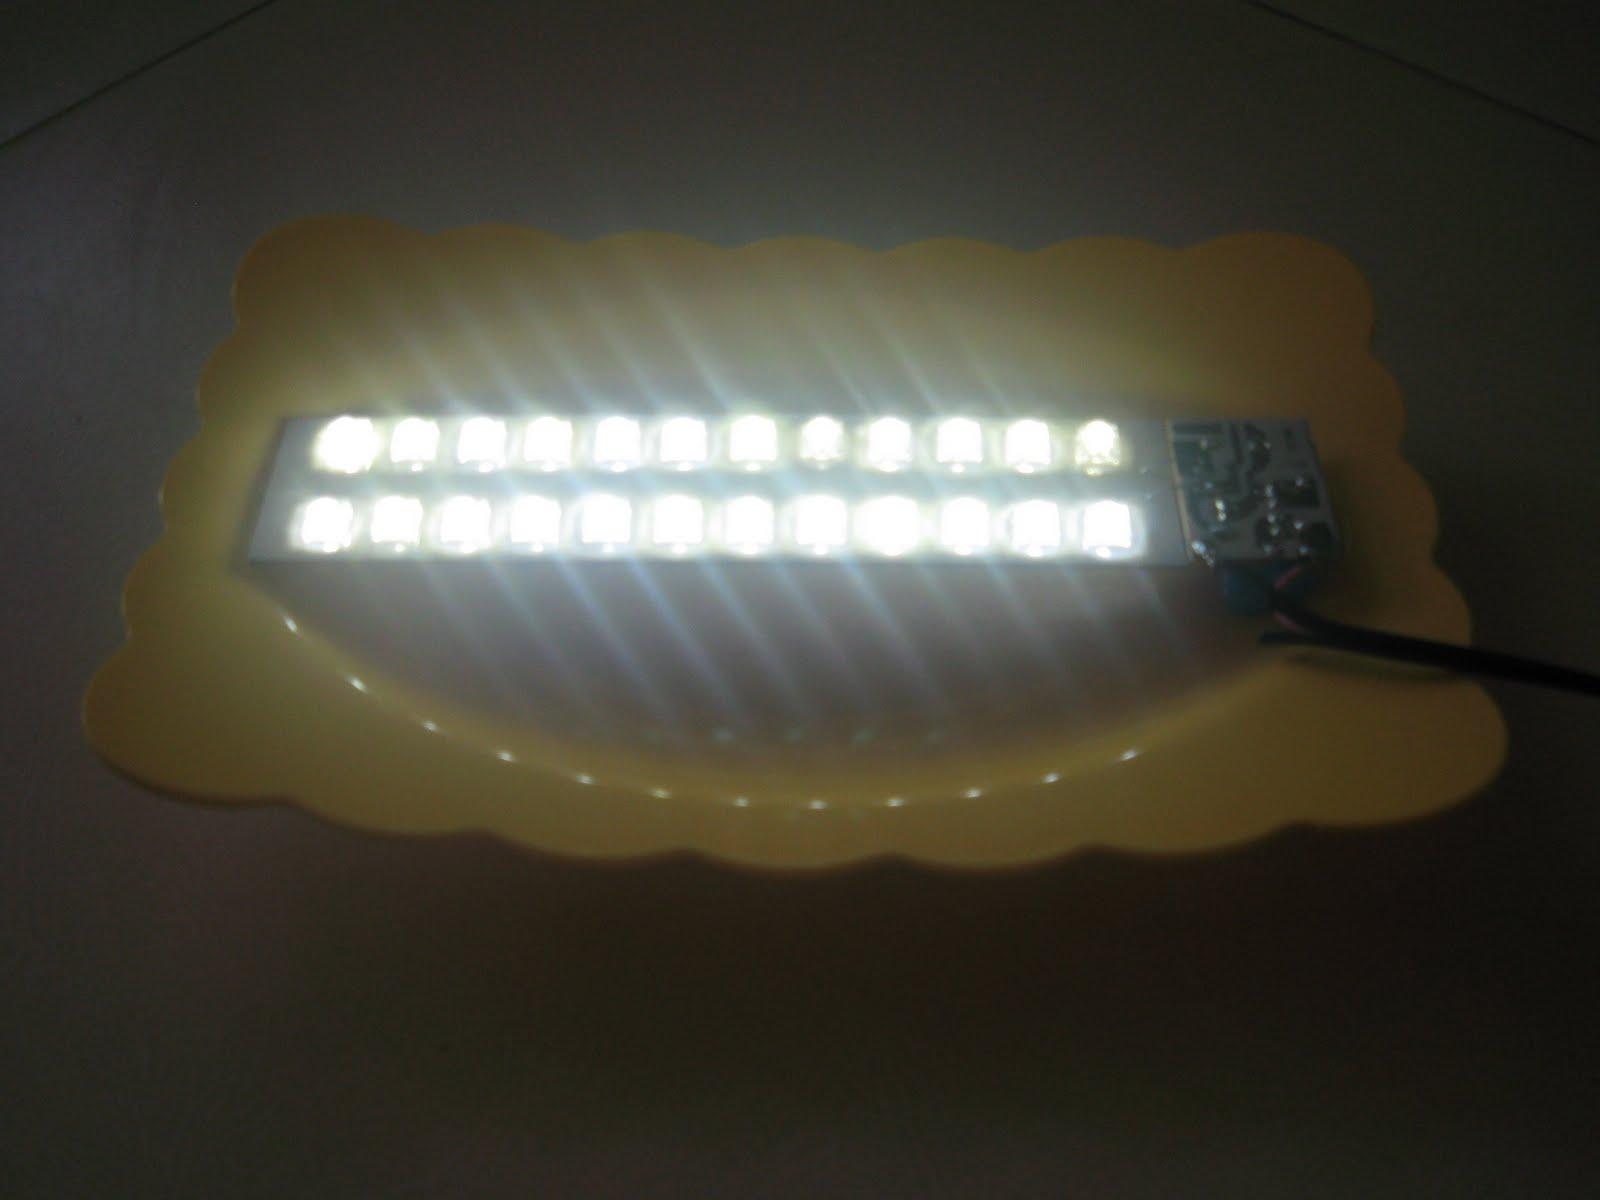 led 220v elektronika rangkaian led 220v inverter rangkaian led 220